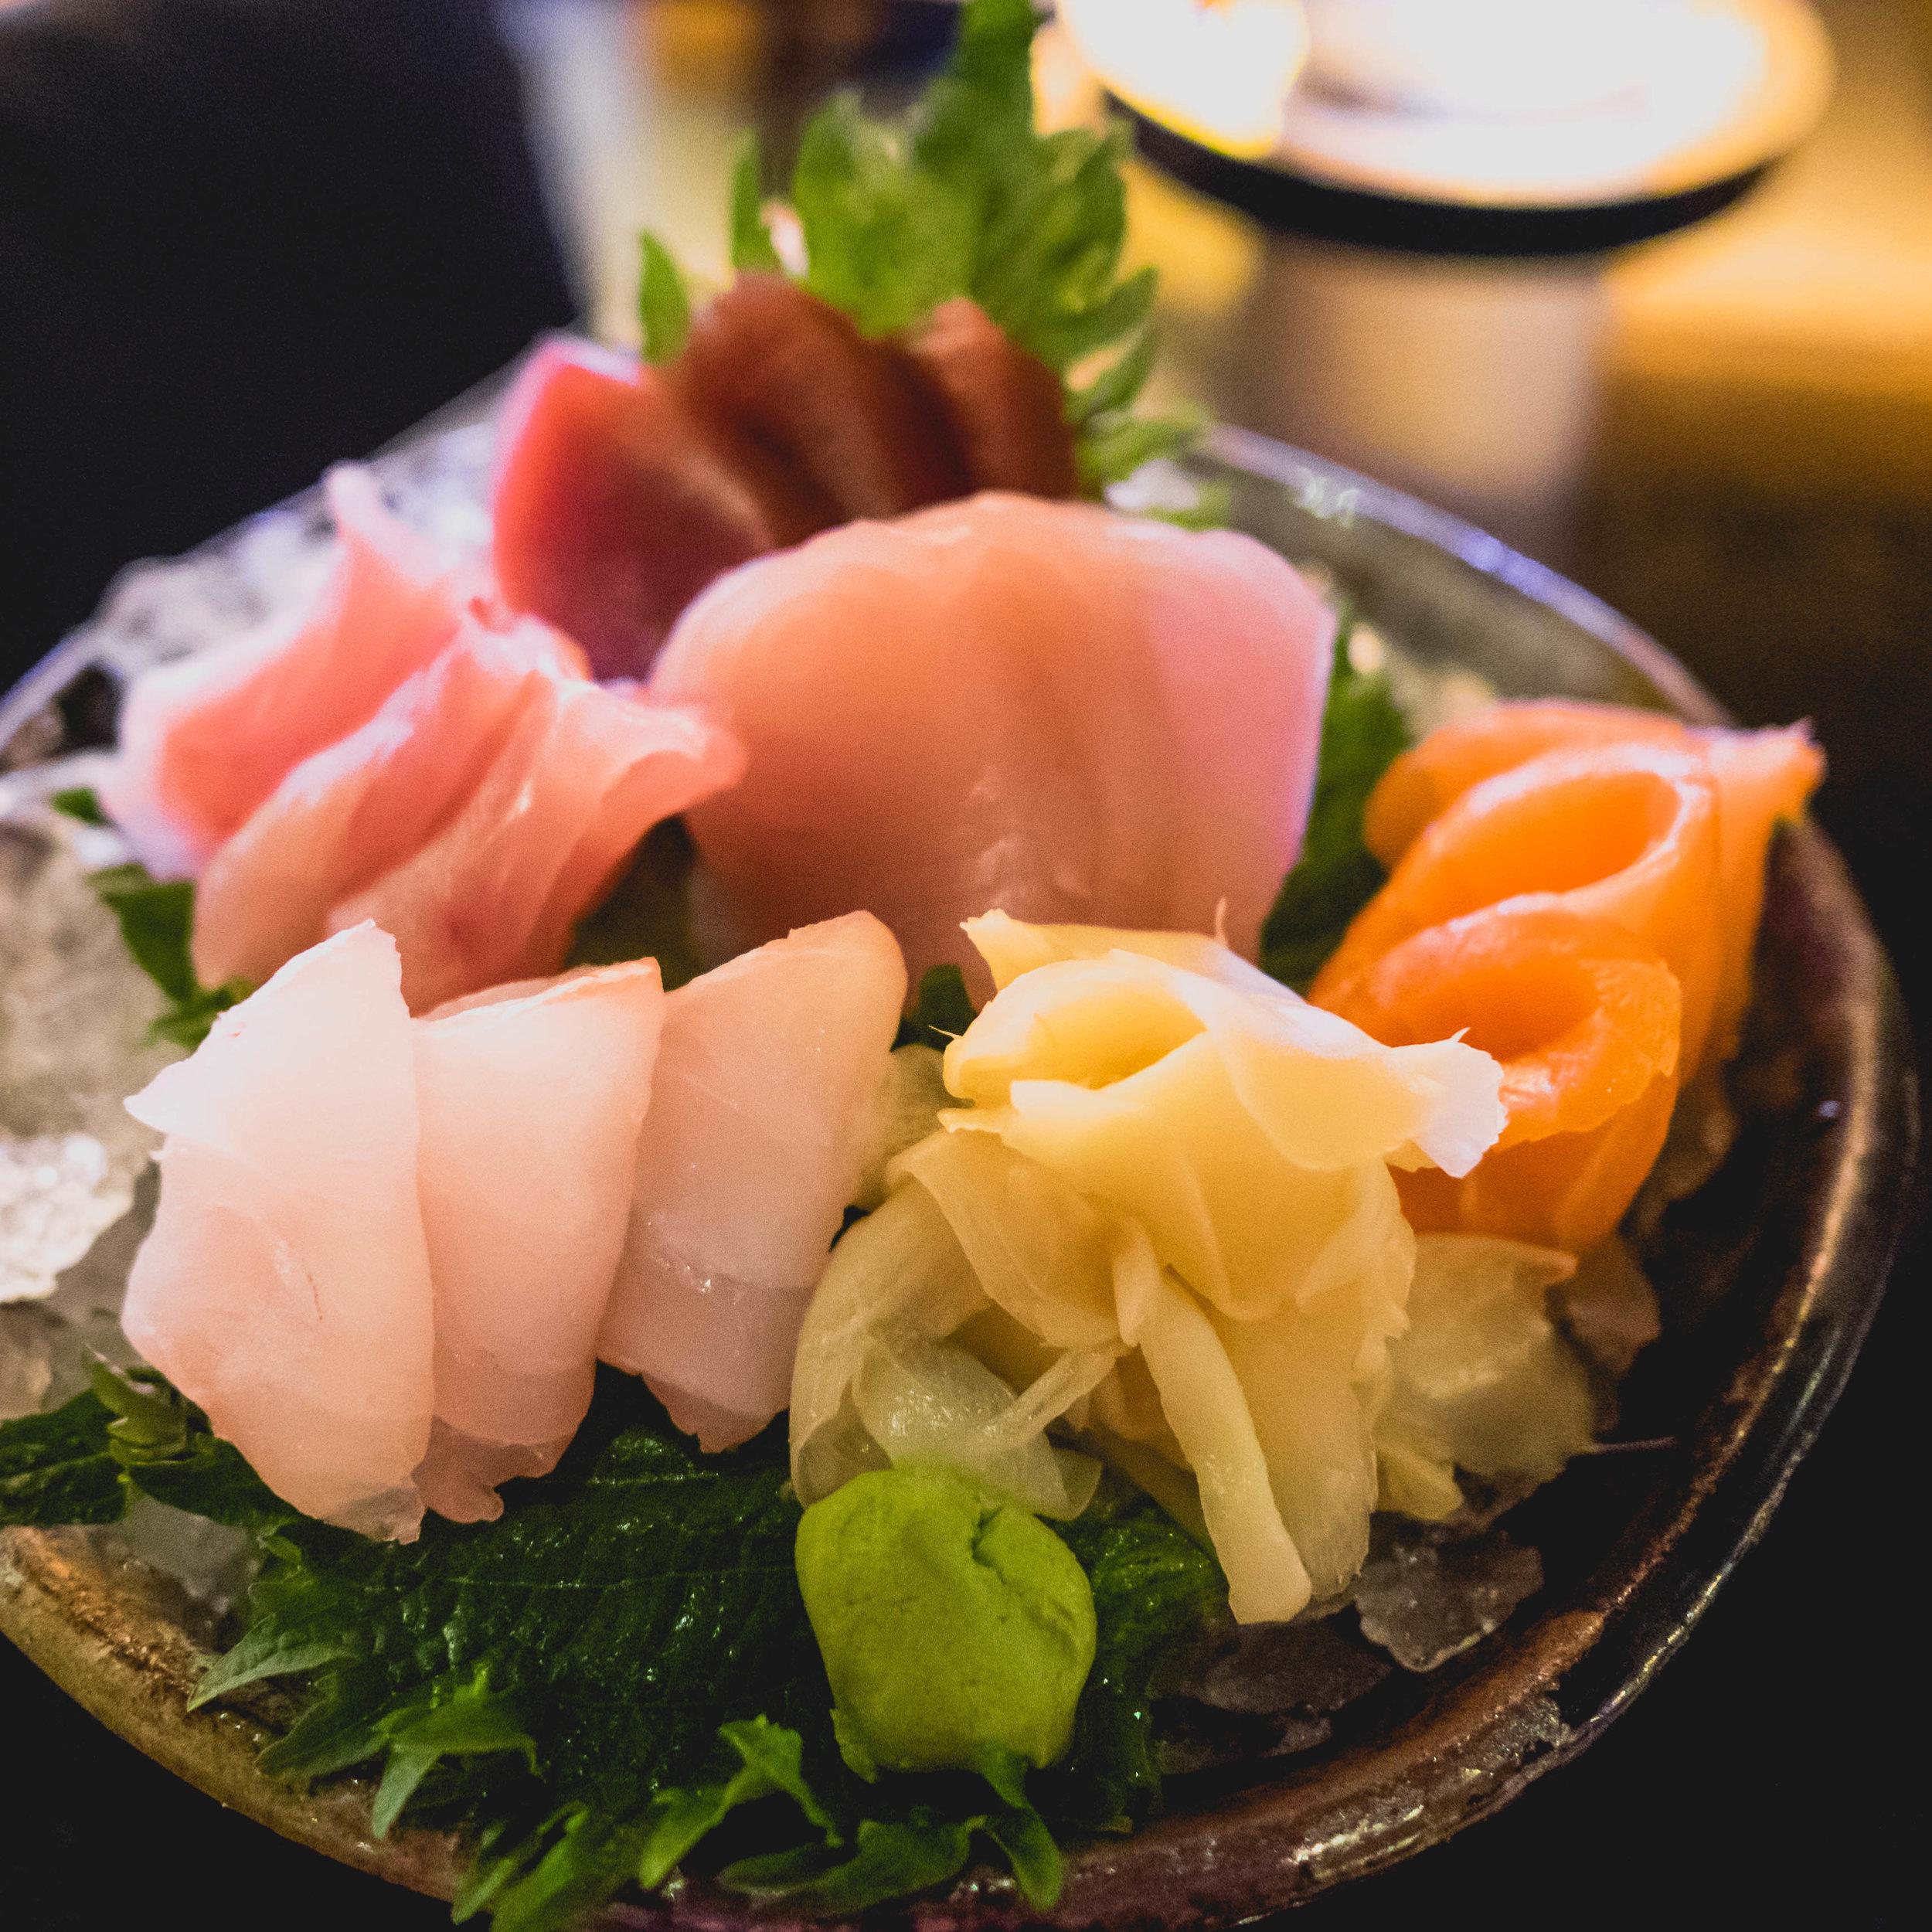 sashimi  of local yellow fin tuna, local wahoo, local snapper, local moon grouper and atlantic salmon at umami .